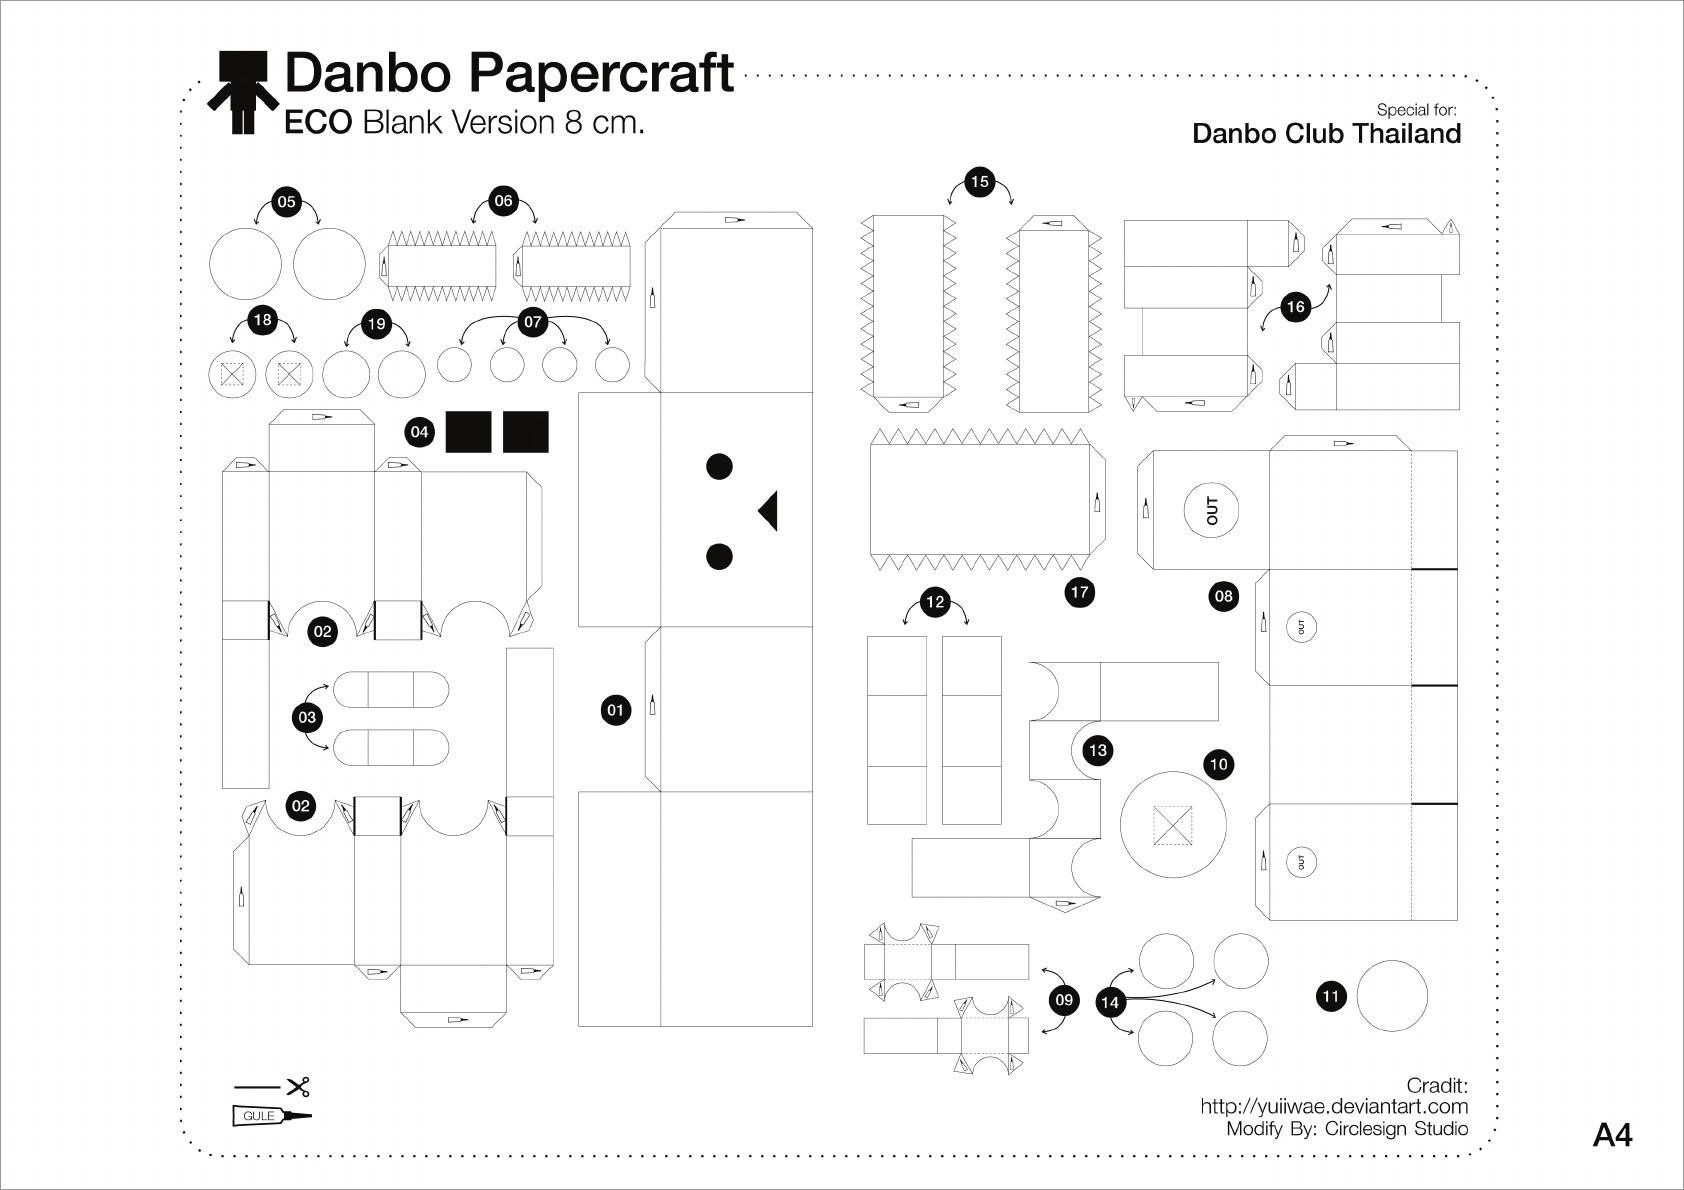 Papercraft Danbo Danbo Papercraft Template